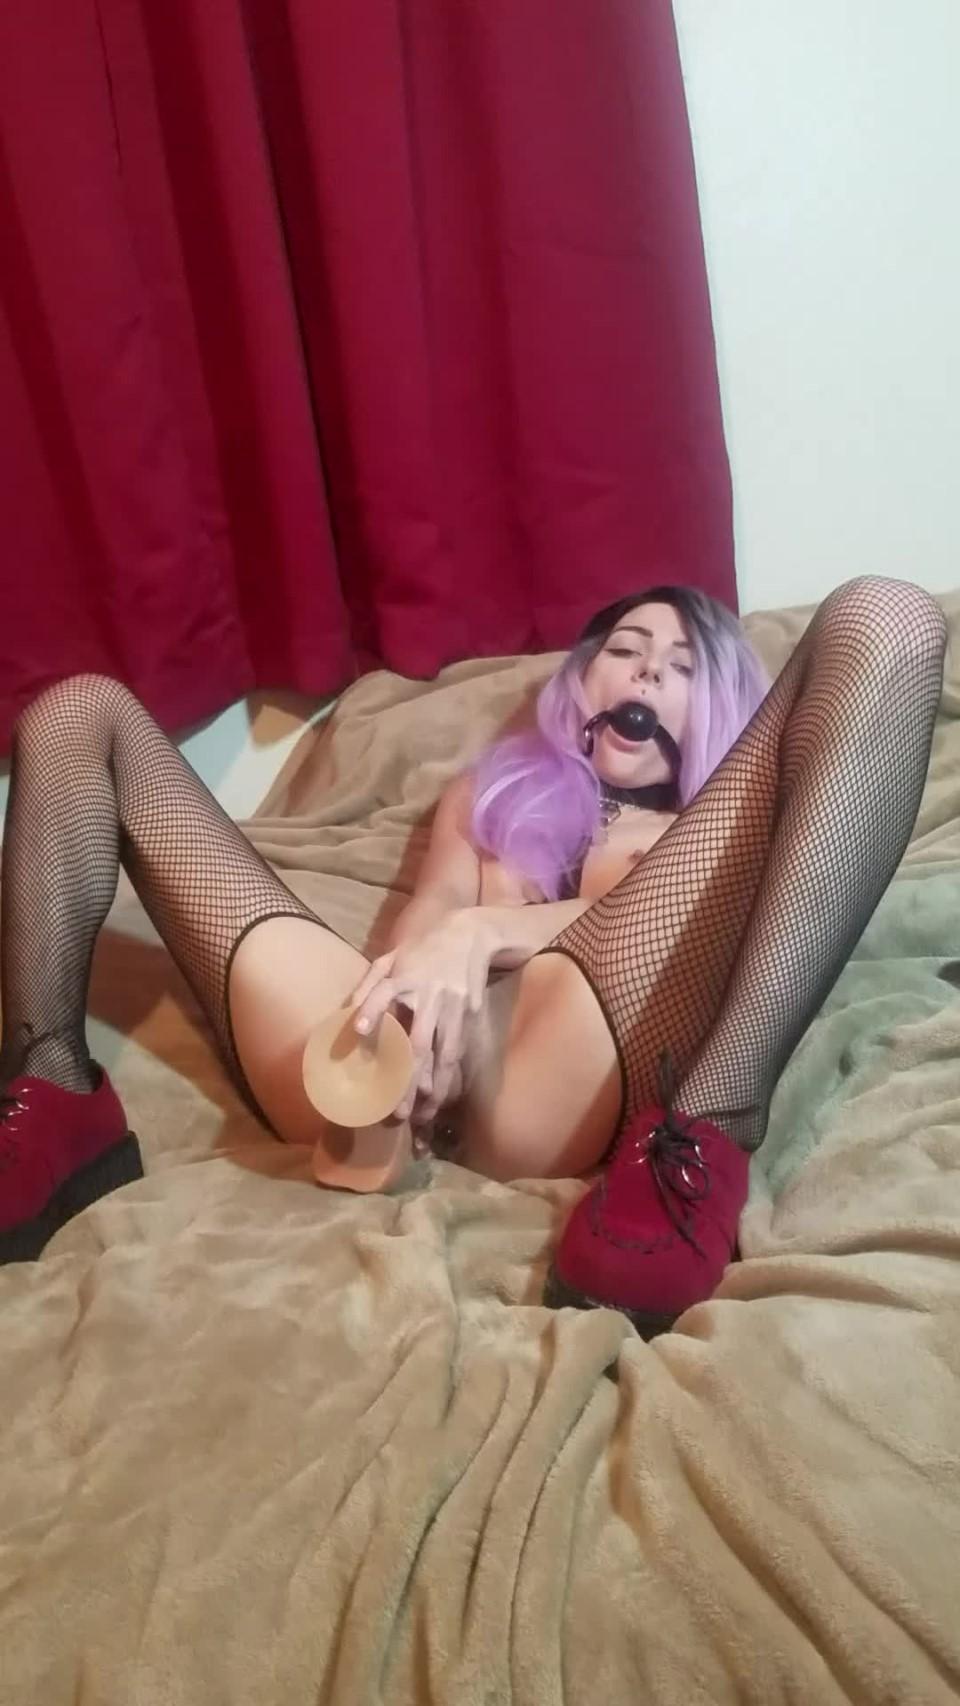 [Full HD] Sasiemayy Gagged Masturbation And Anal Play Sasiemayy - ManyVids-00:05:02   Ballgagged, Butt Plug, Foot Fetish, Hairy Armpits, Masturbation - 621,3 MB